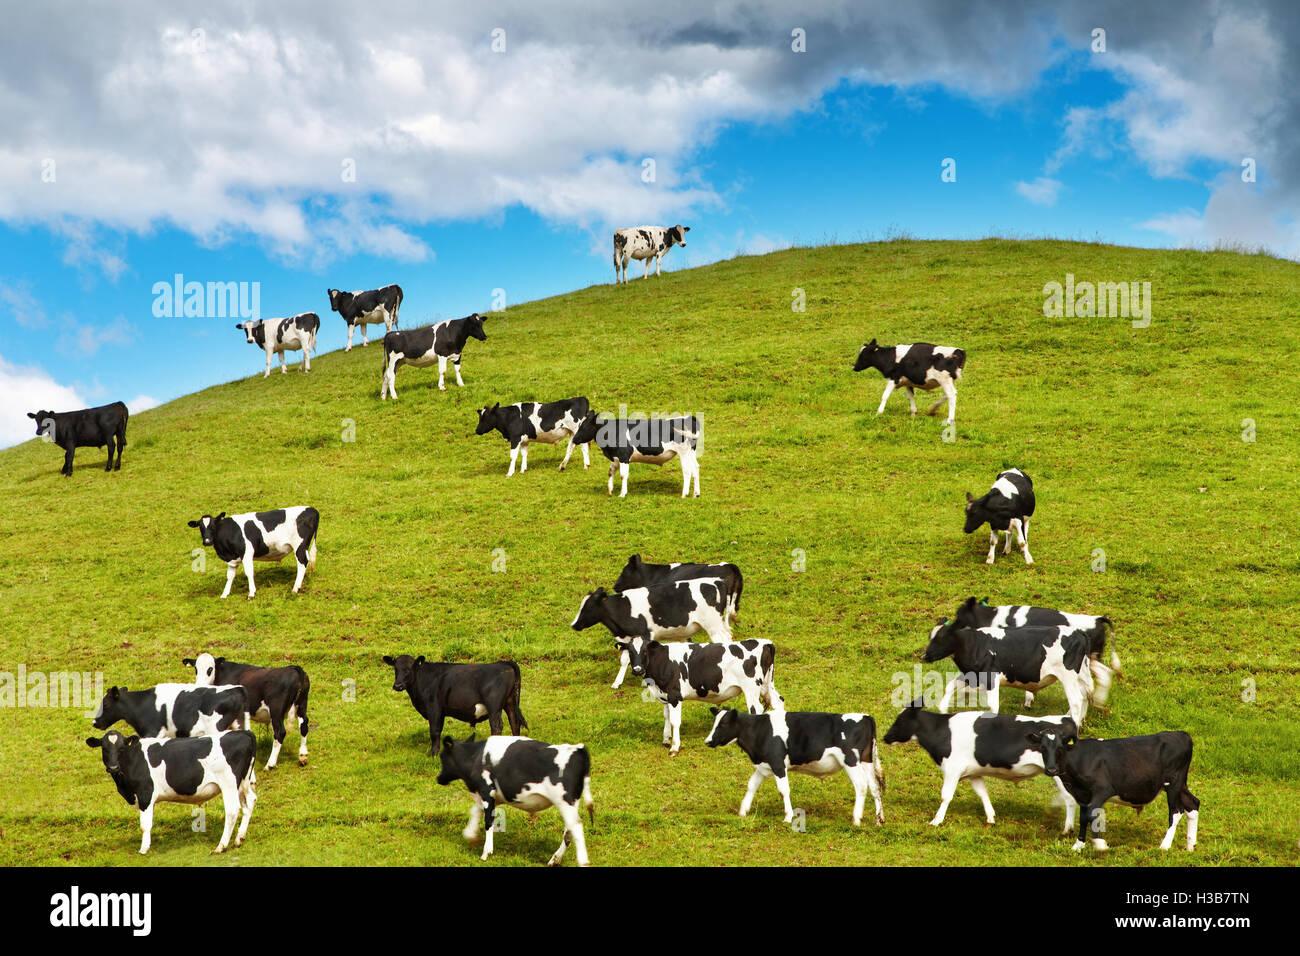 Grazing calves on green hill, New Zealand - Stock Image